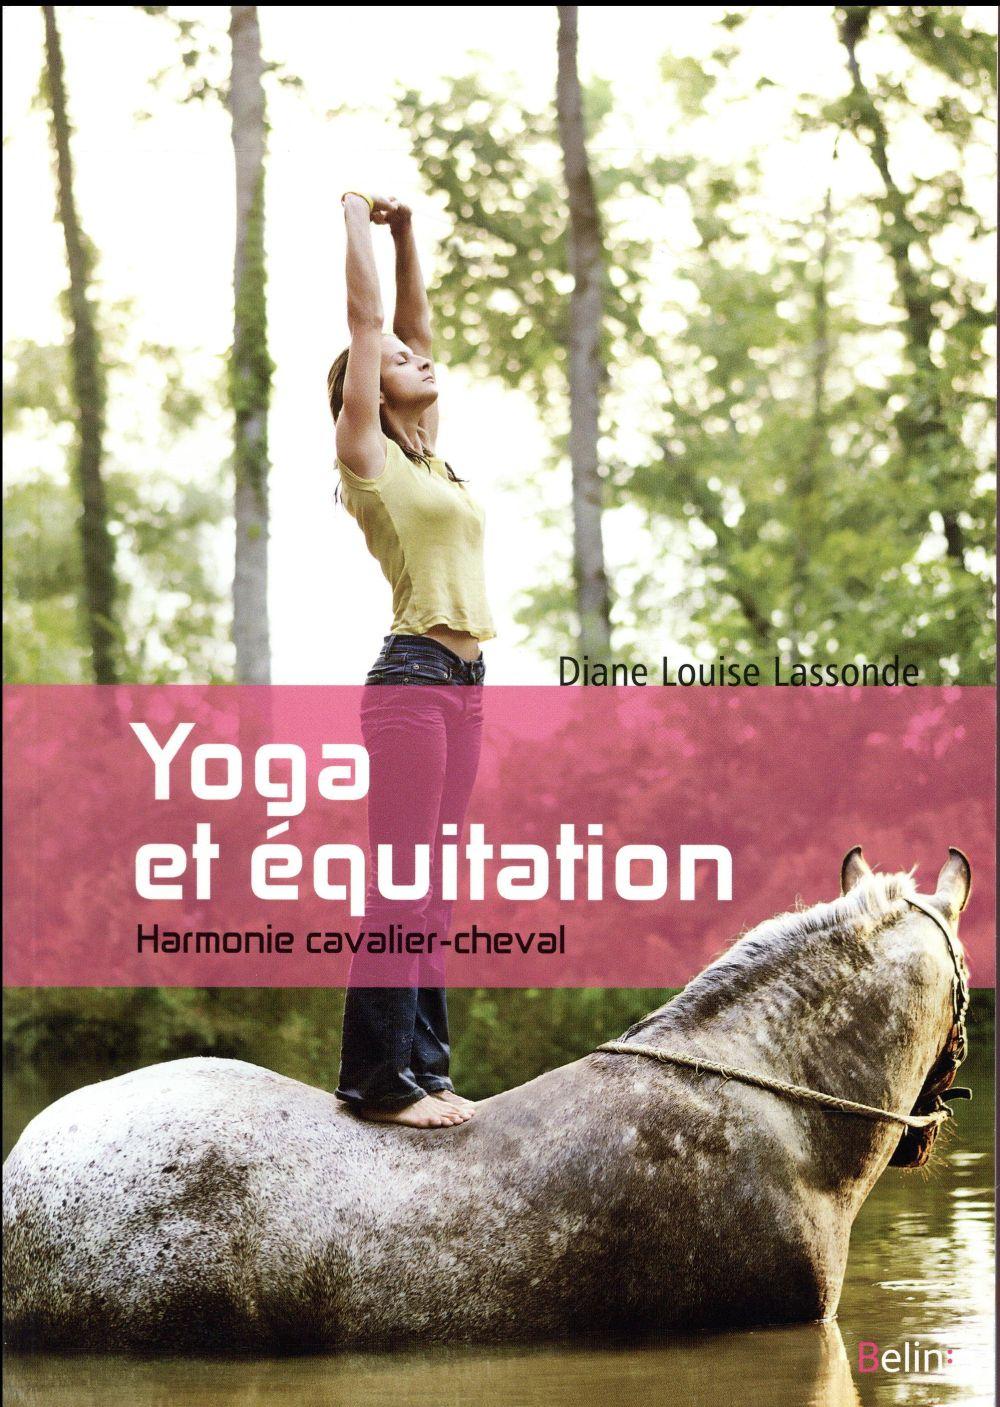 Yoga et équitation ; harmonie cavalier-cheval